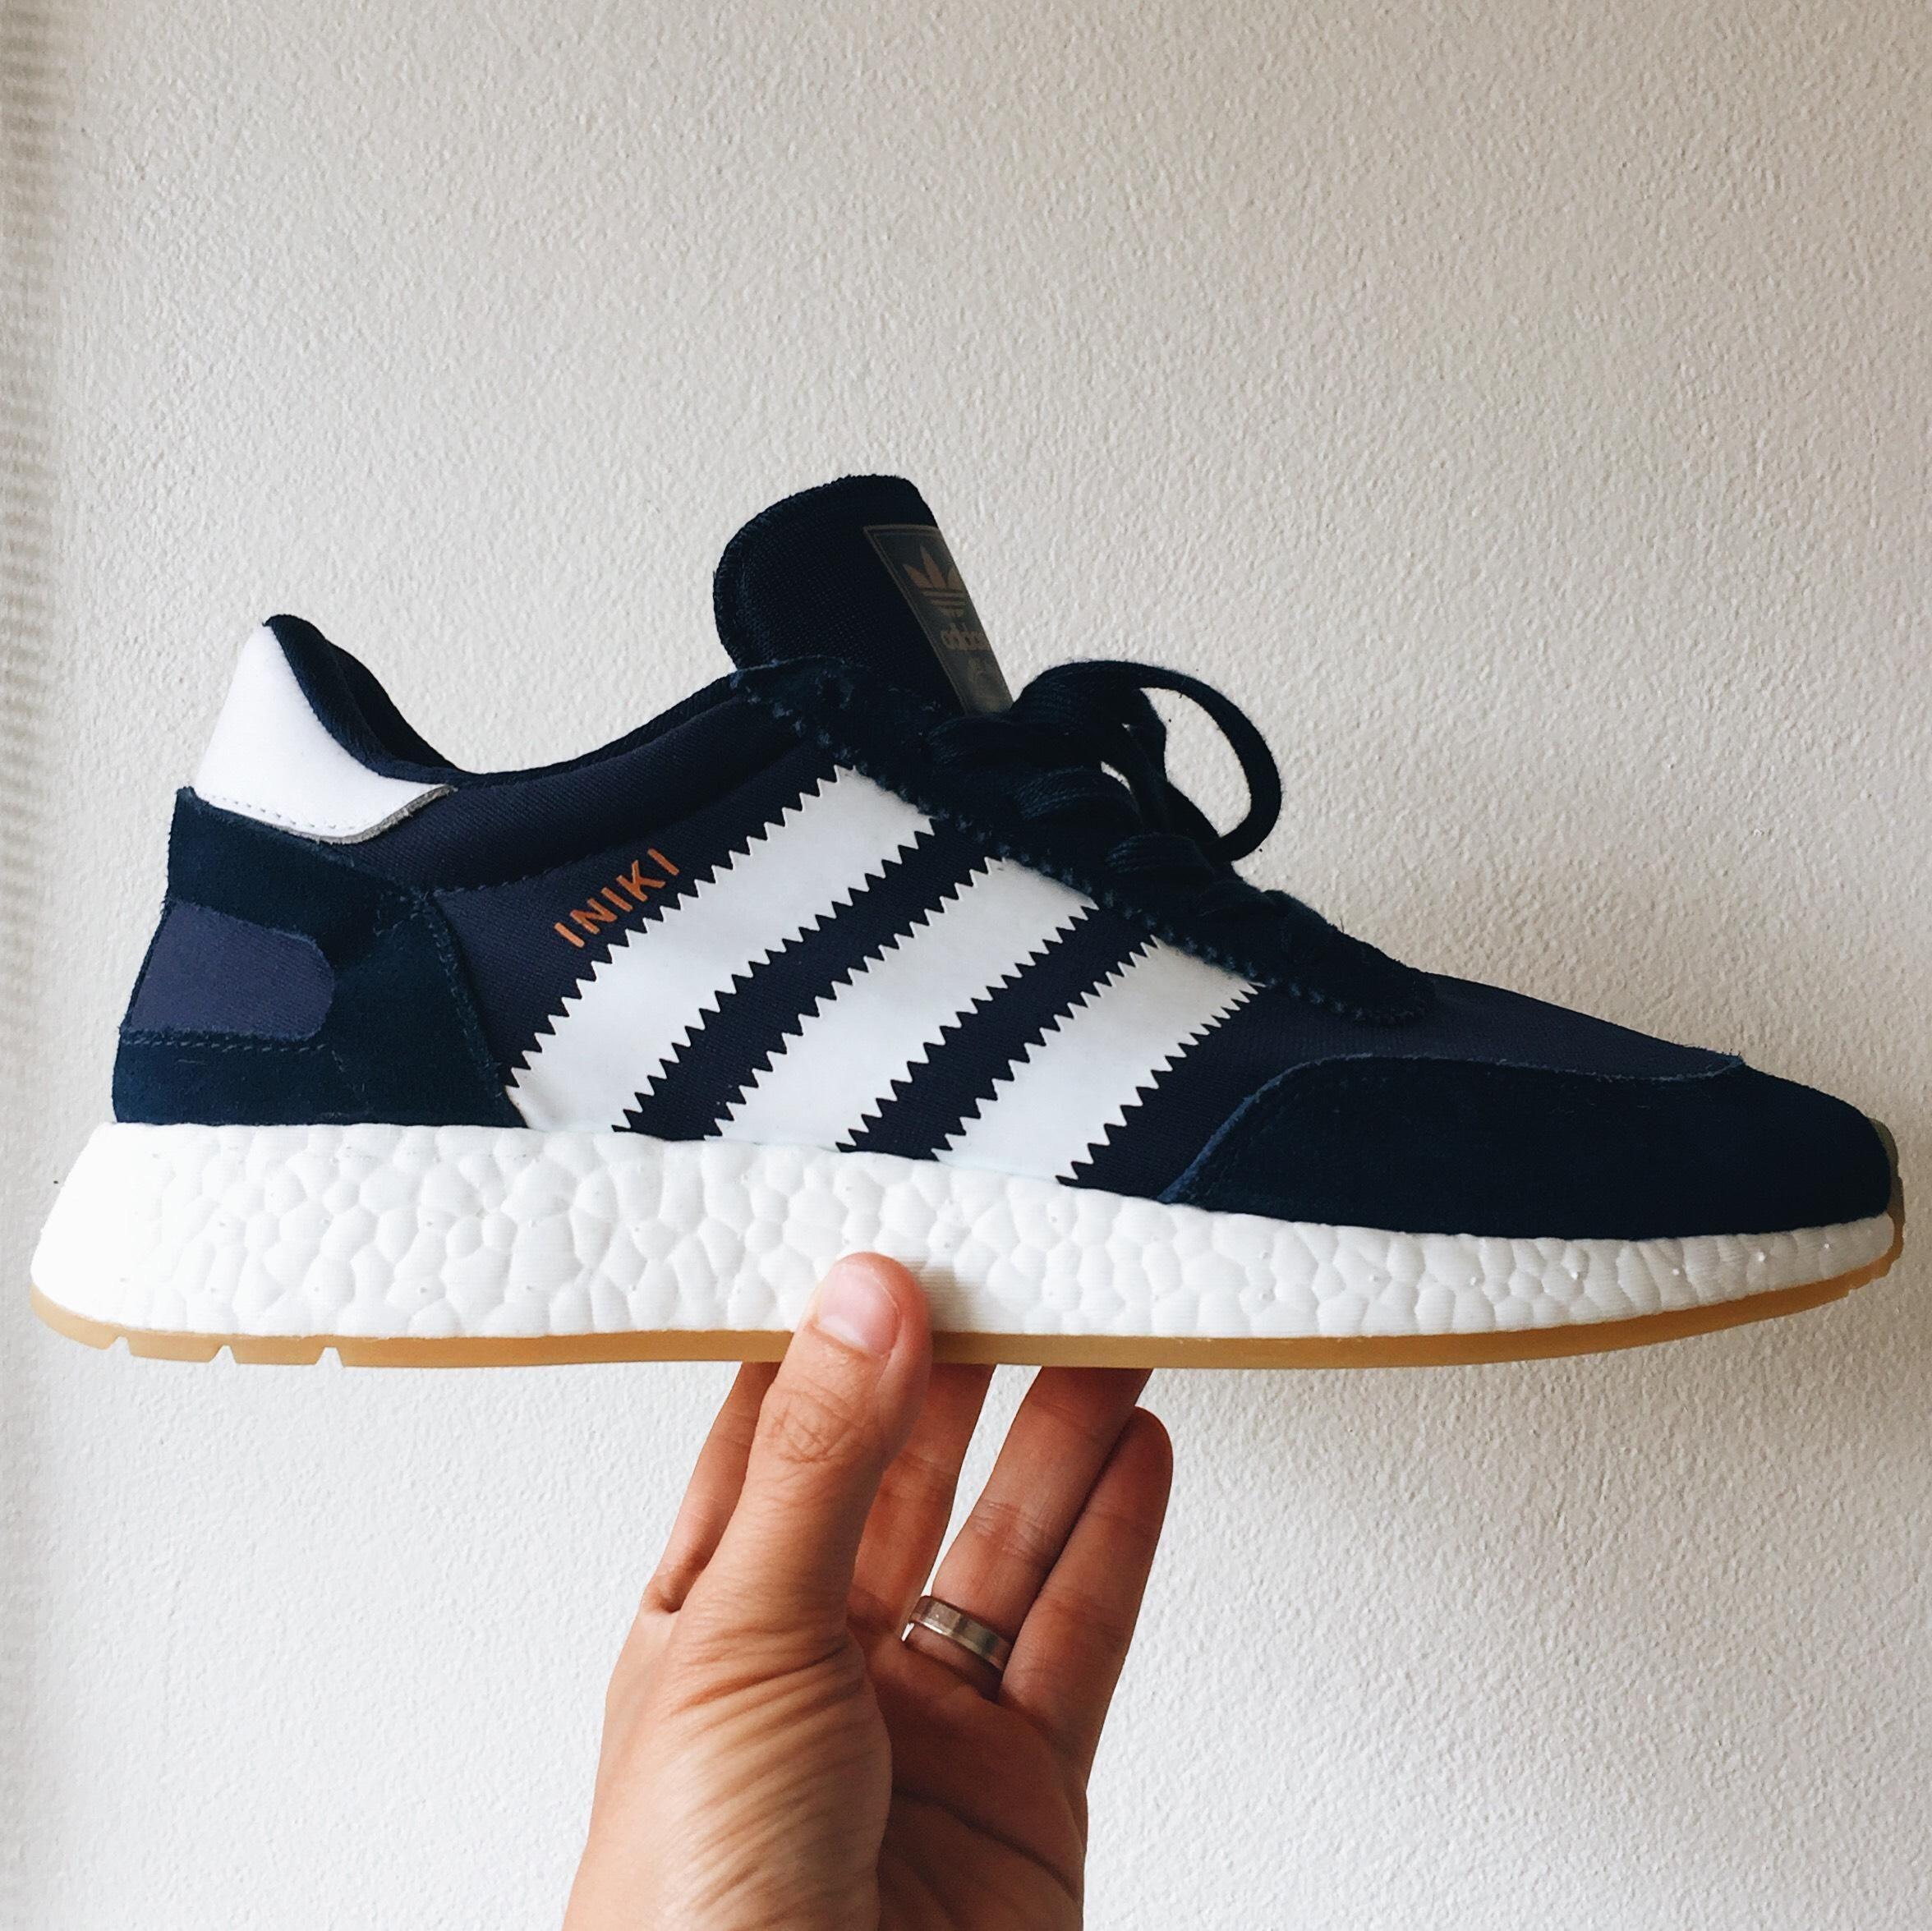 [PICKUP] Adidas Iniki Runner